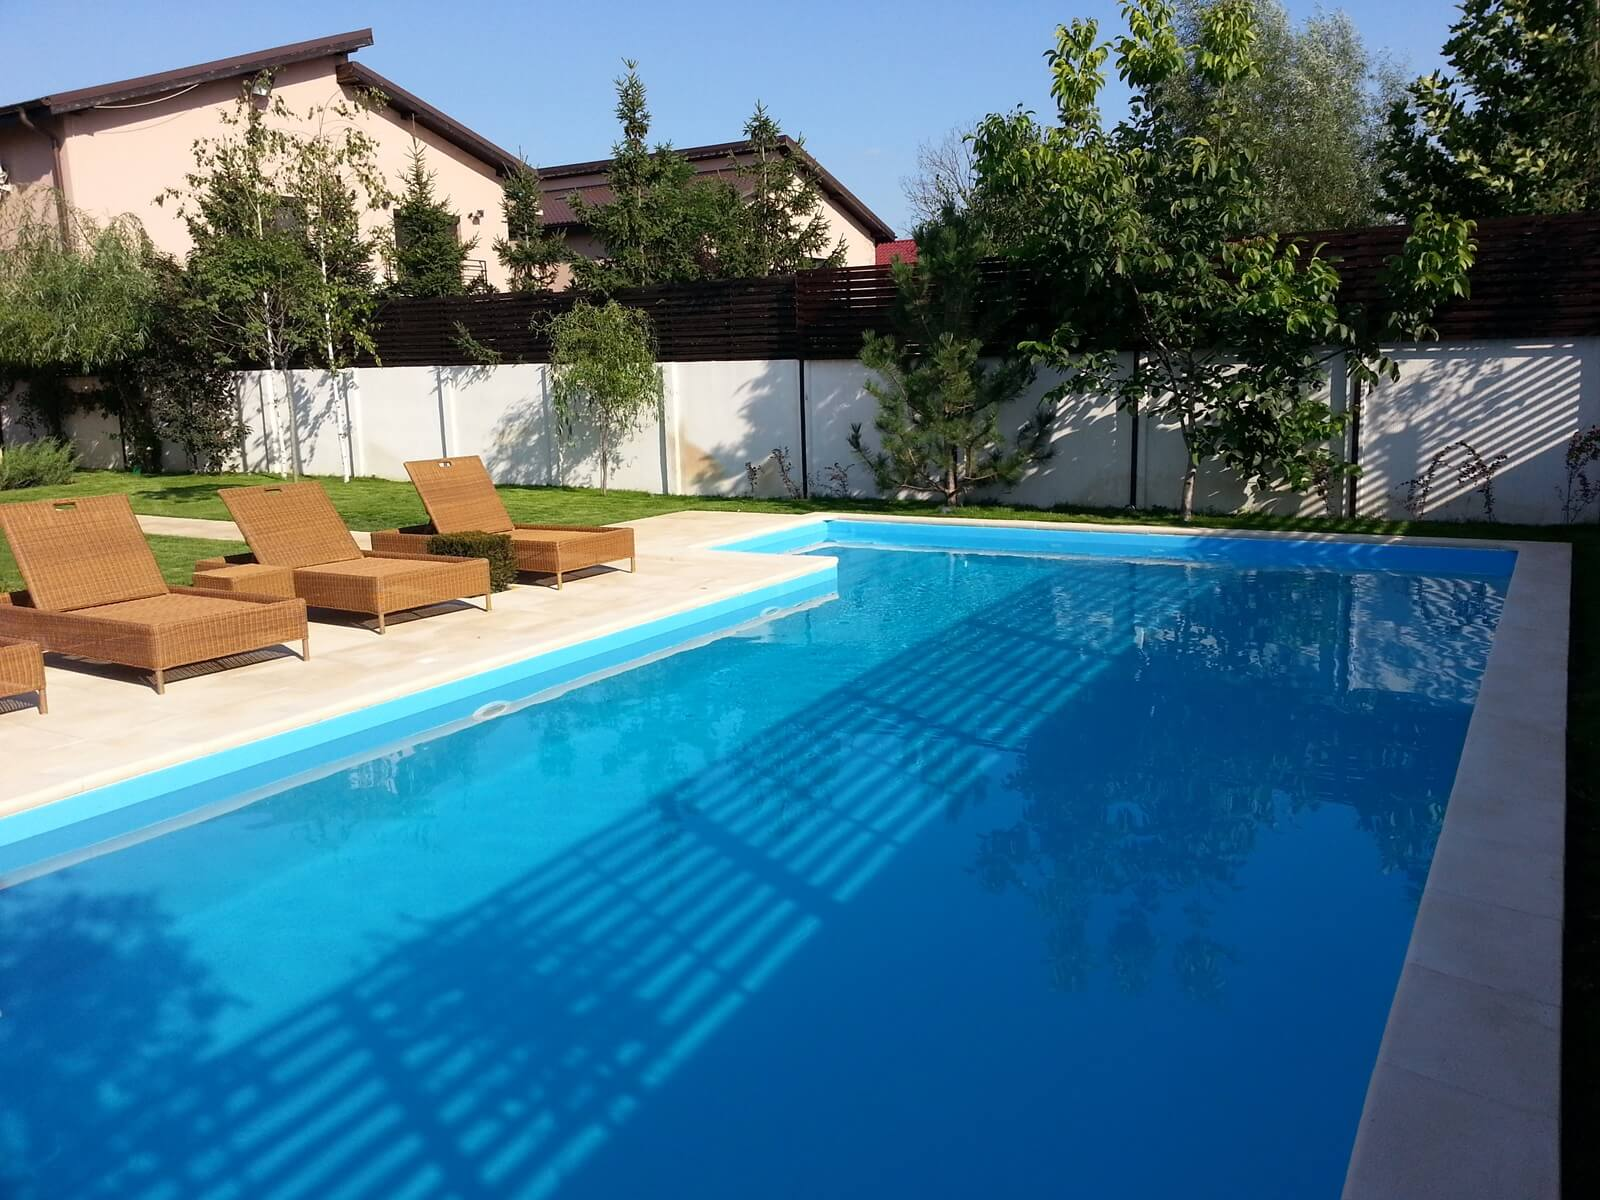 Piscina exterioara din beton cu skimmer finisata cu liner for Aqua 2000 piscine